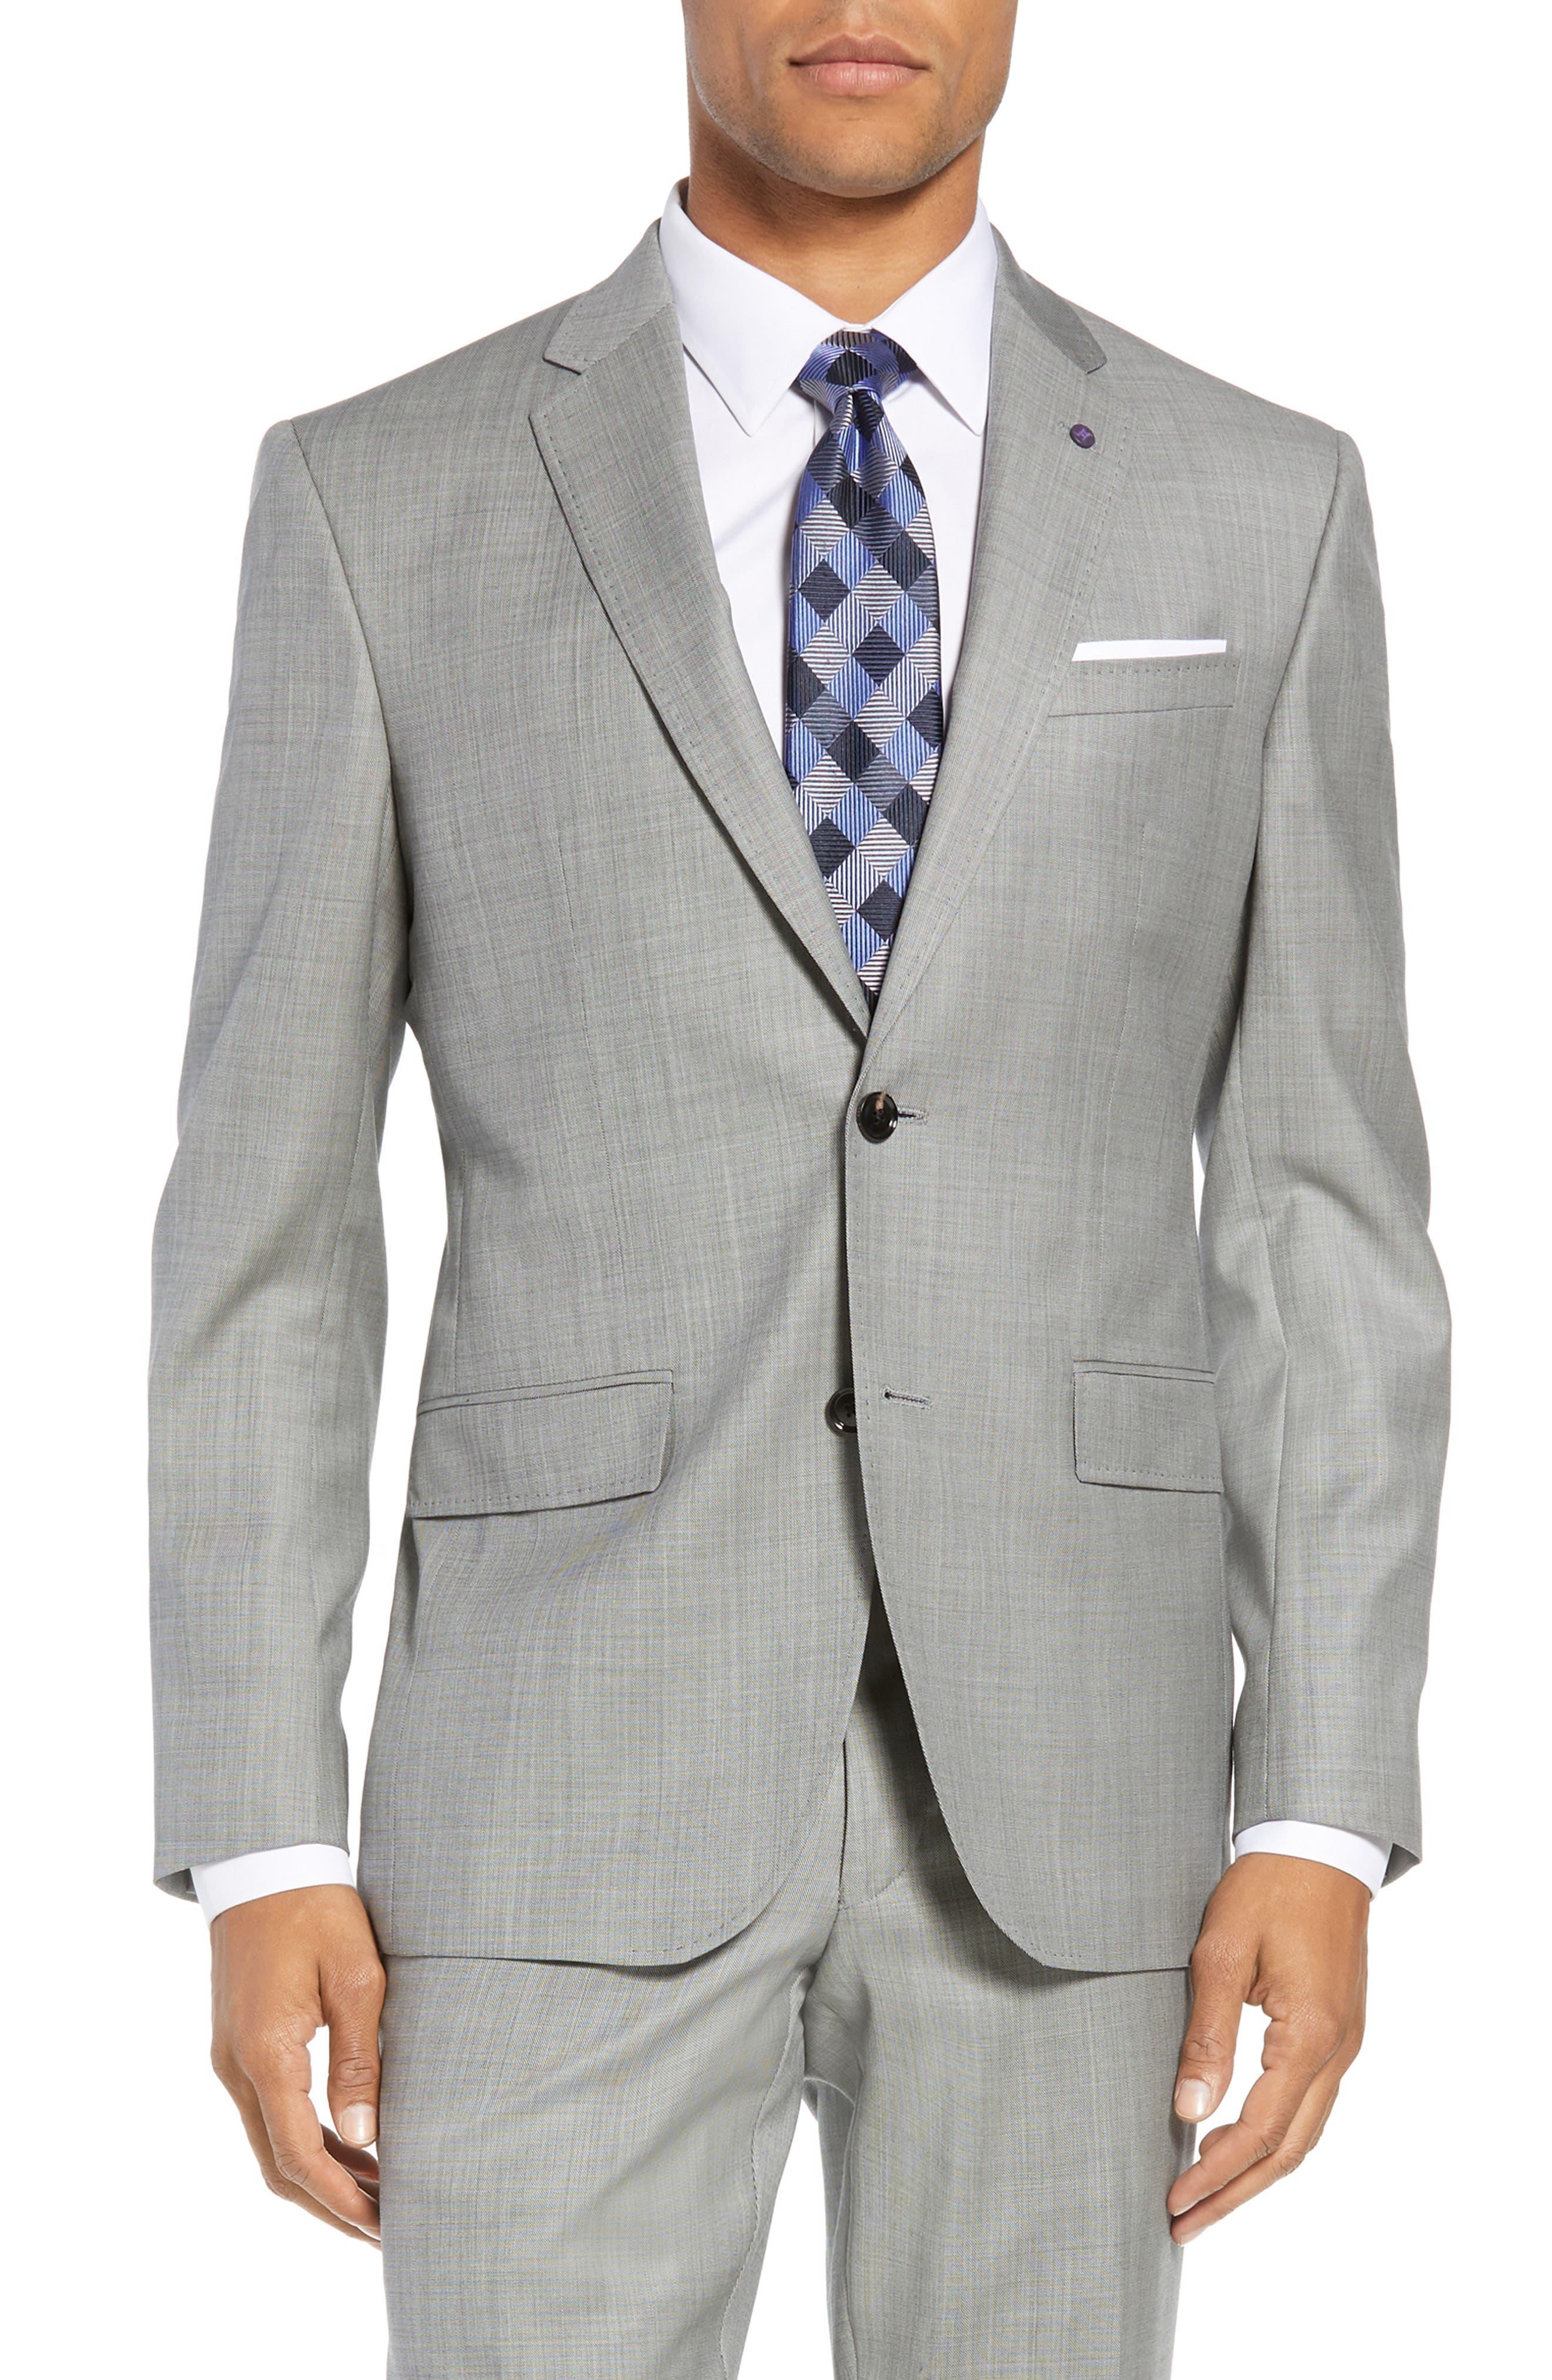 Jay Trim Fit Solid Wool Suit,                             Alternate thumbnail 5, color,                             LIGHT GREY